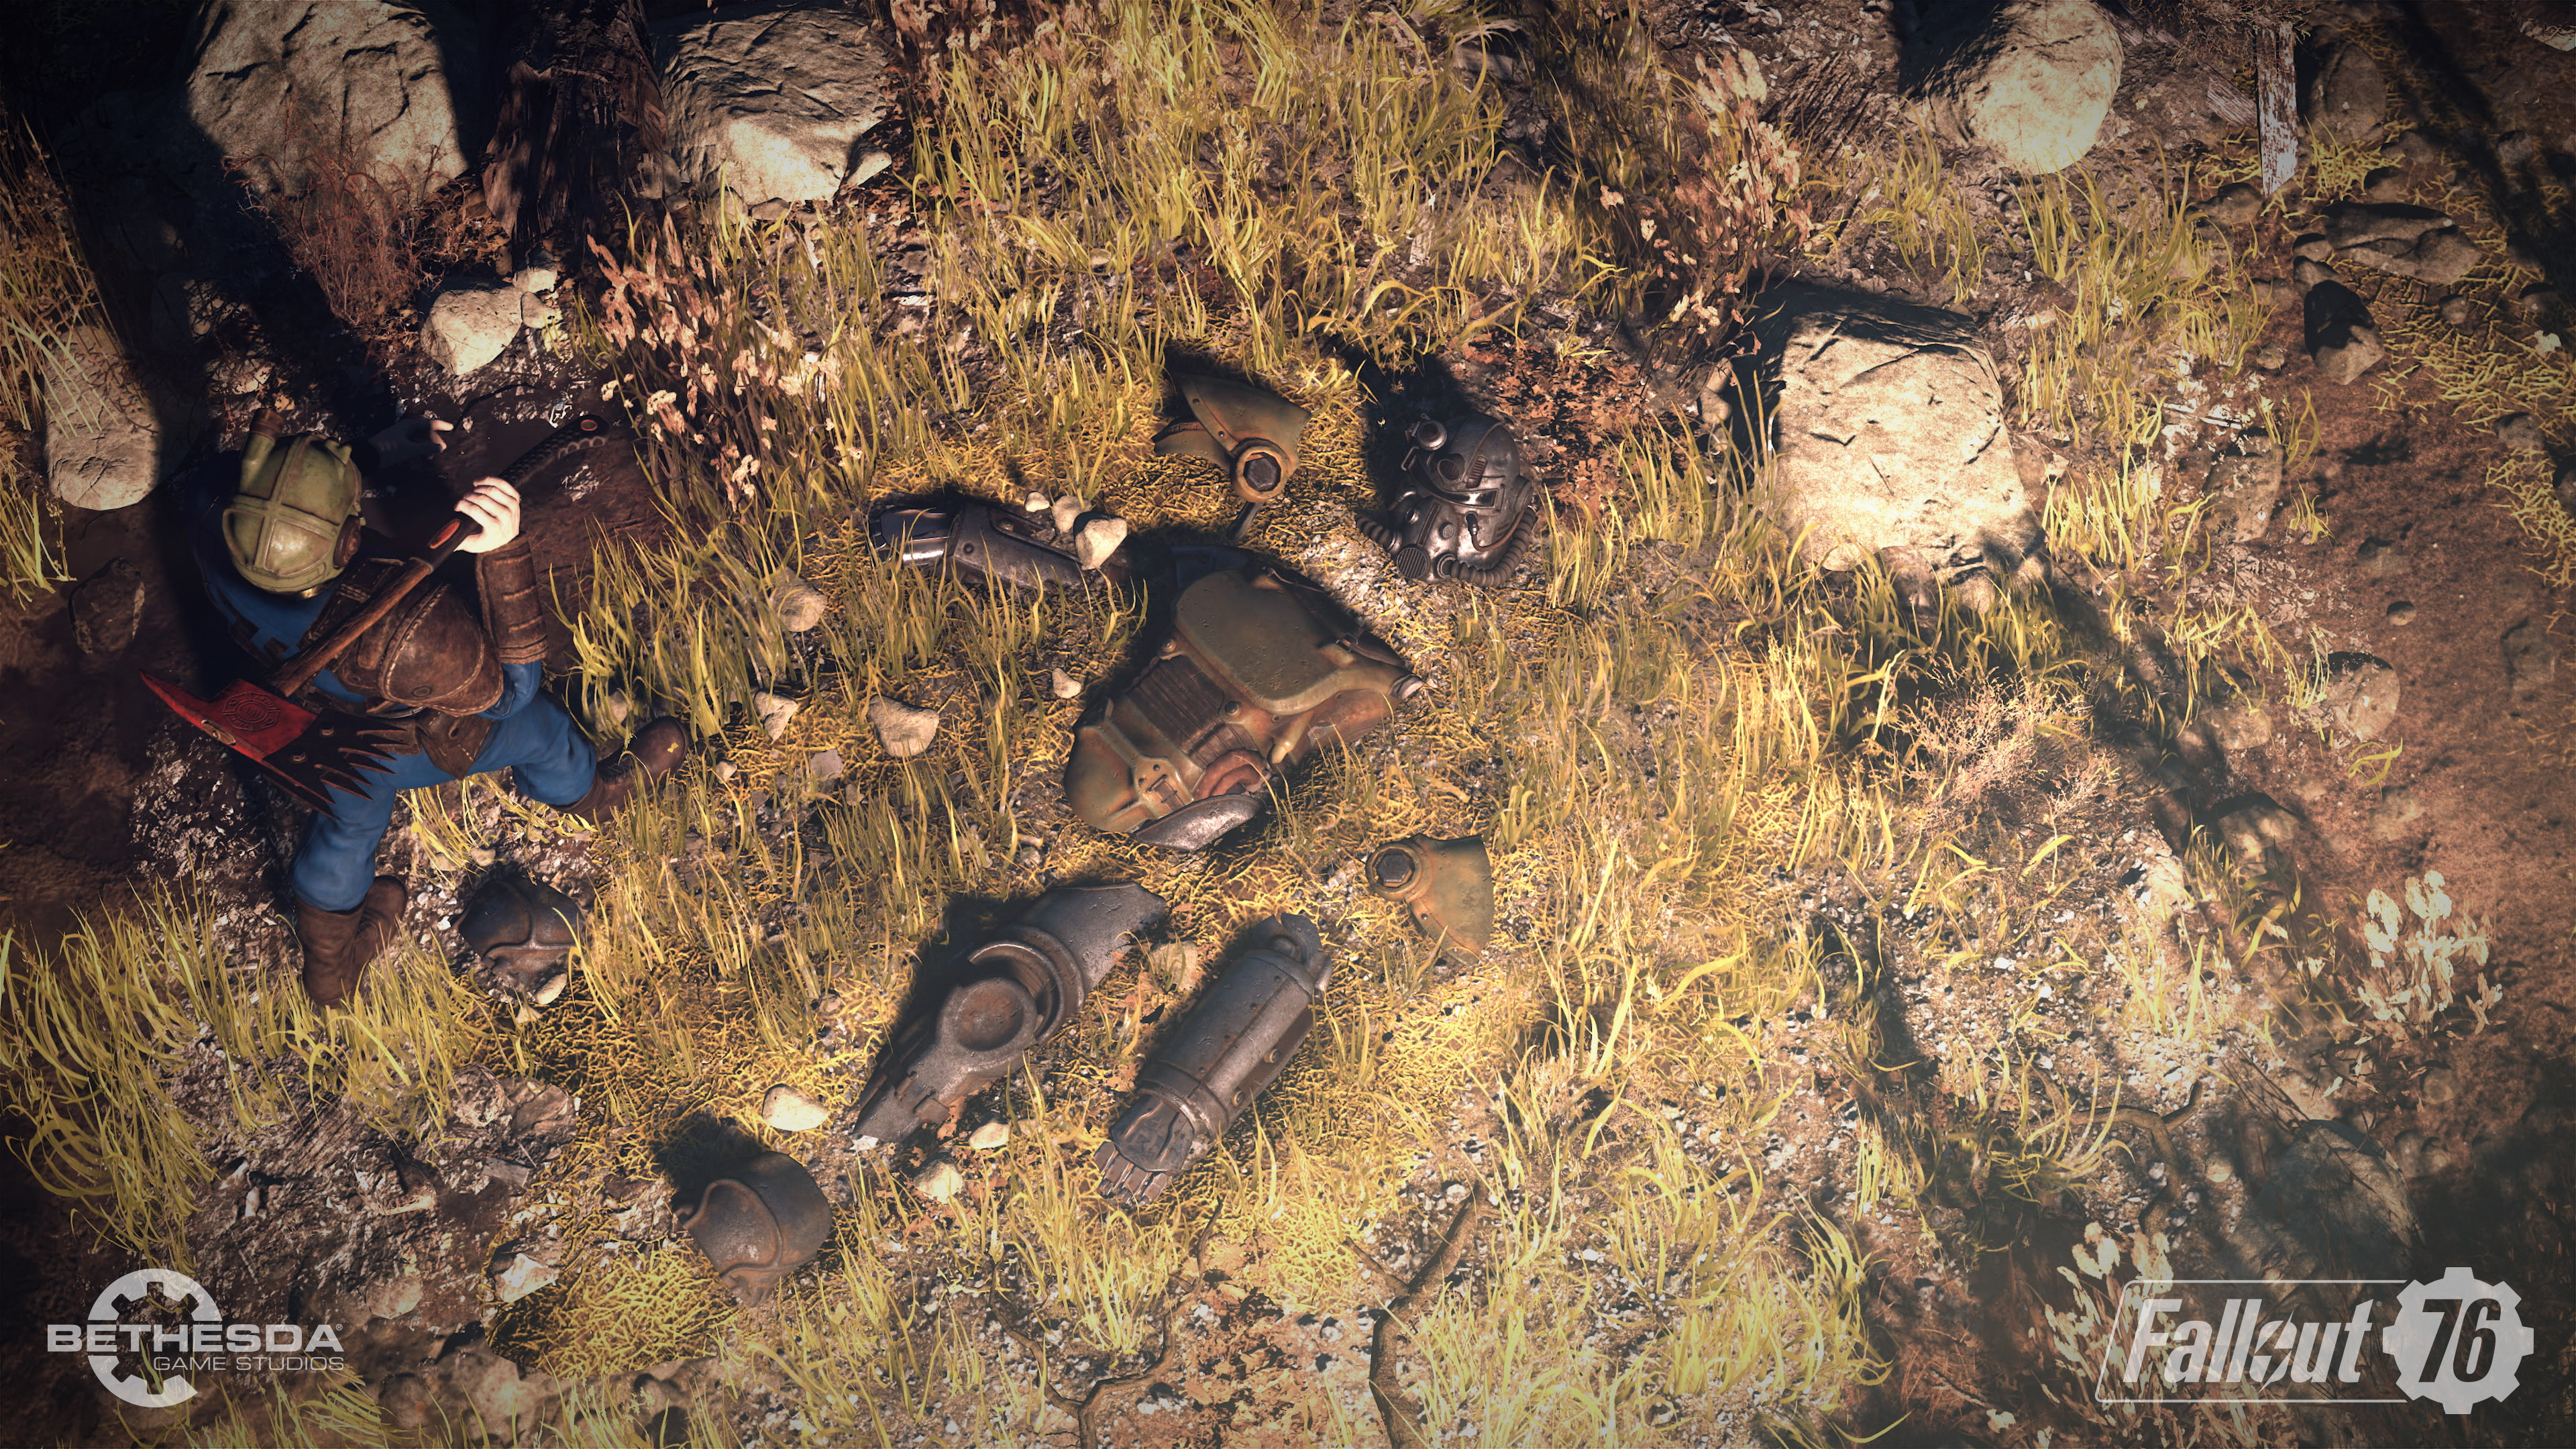 Fallout76 E3 Relic